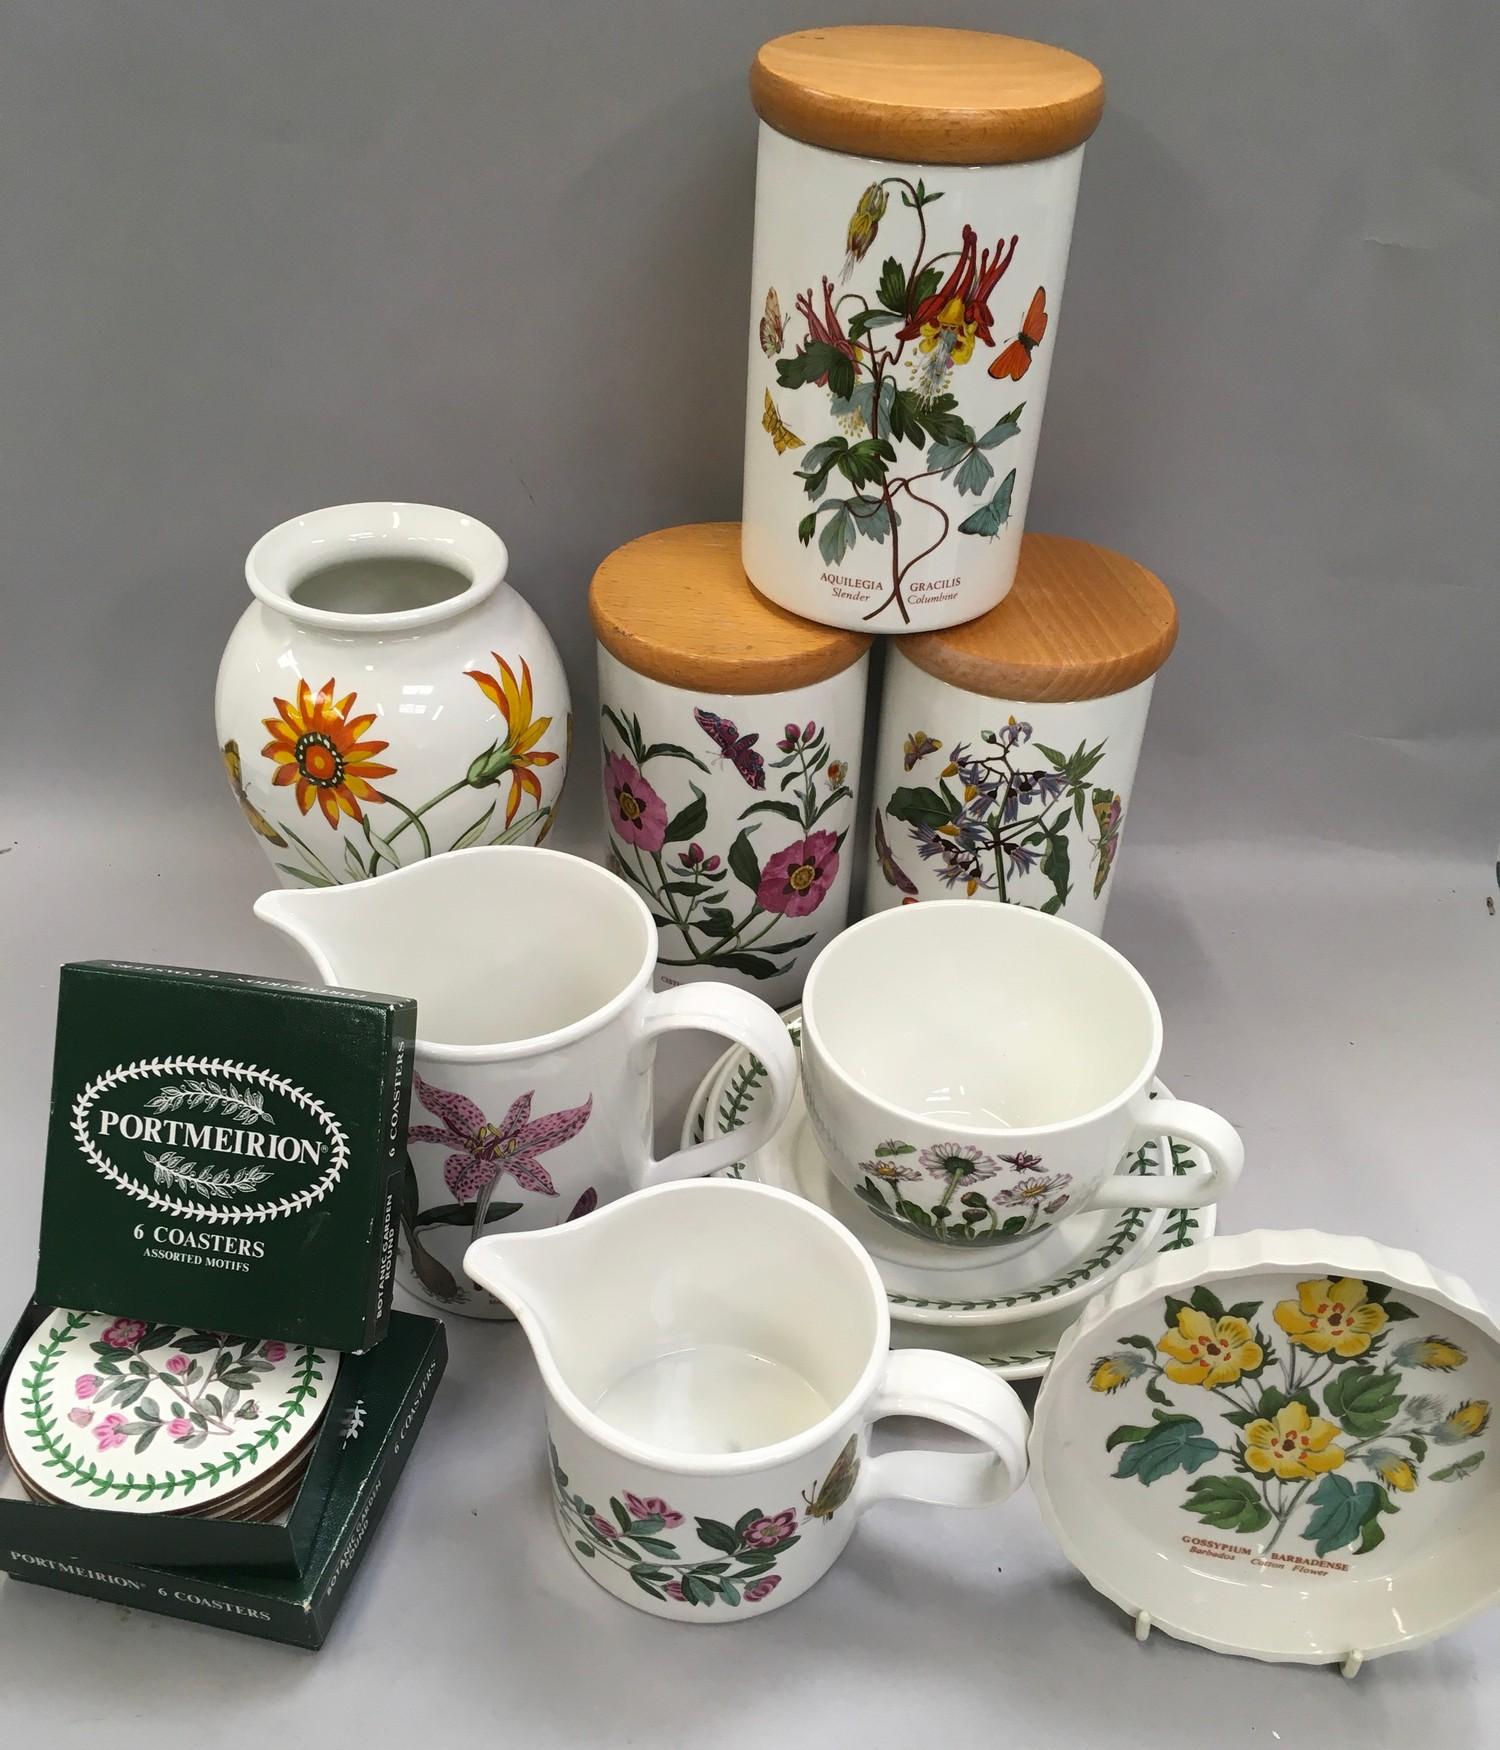 Portmerion Botanic Gardens storage jars, vase ,jugs ,coasters etc (13)